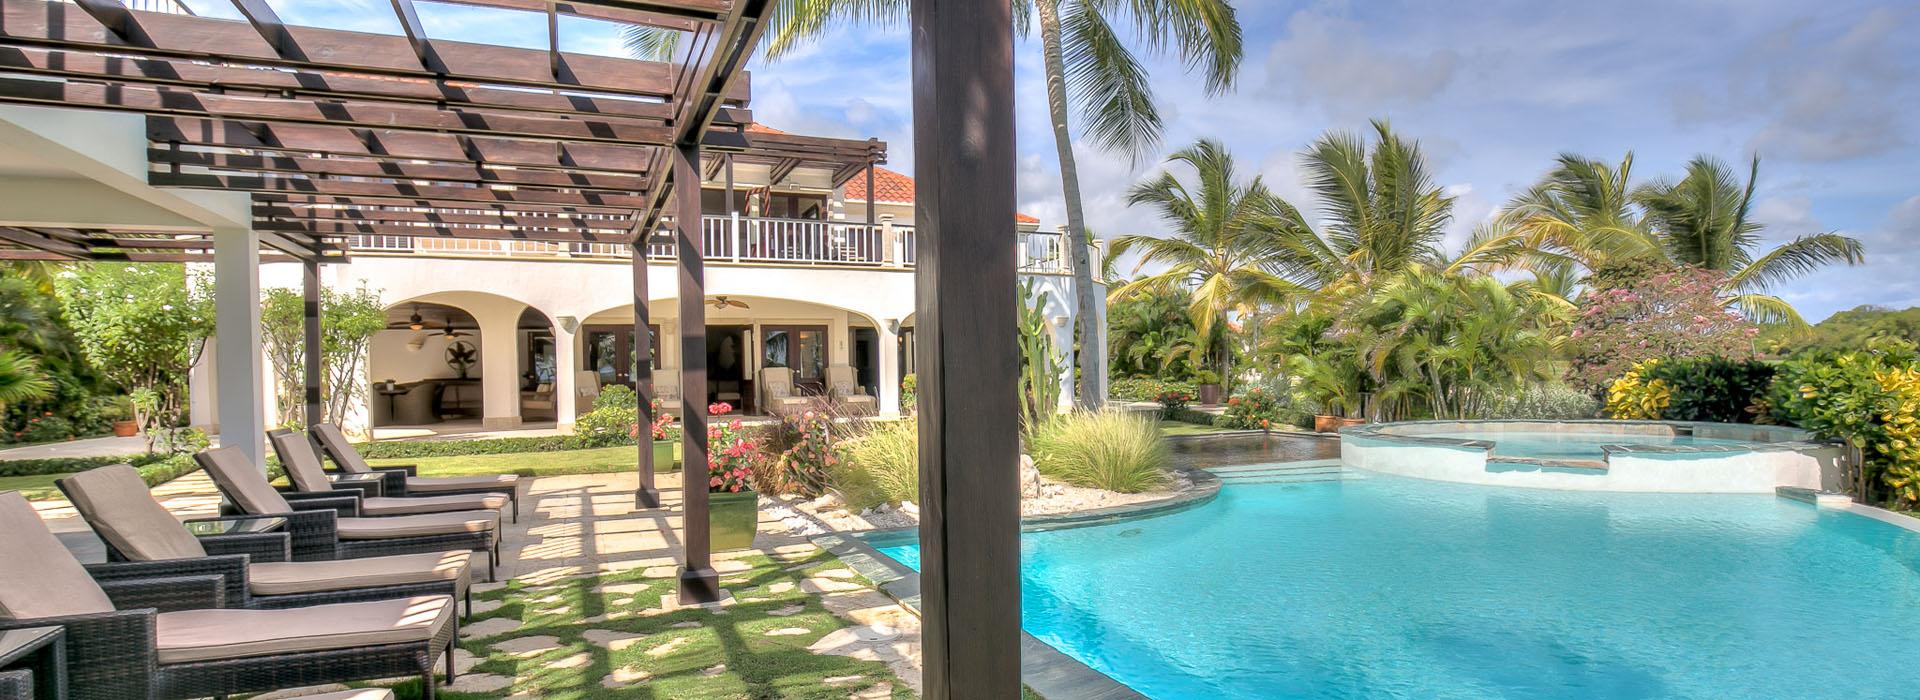 Arrecife Estate